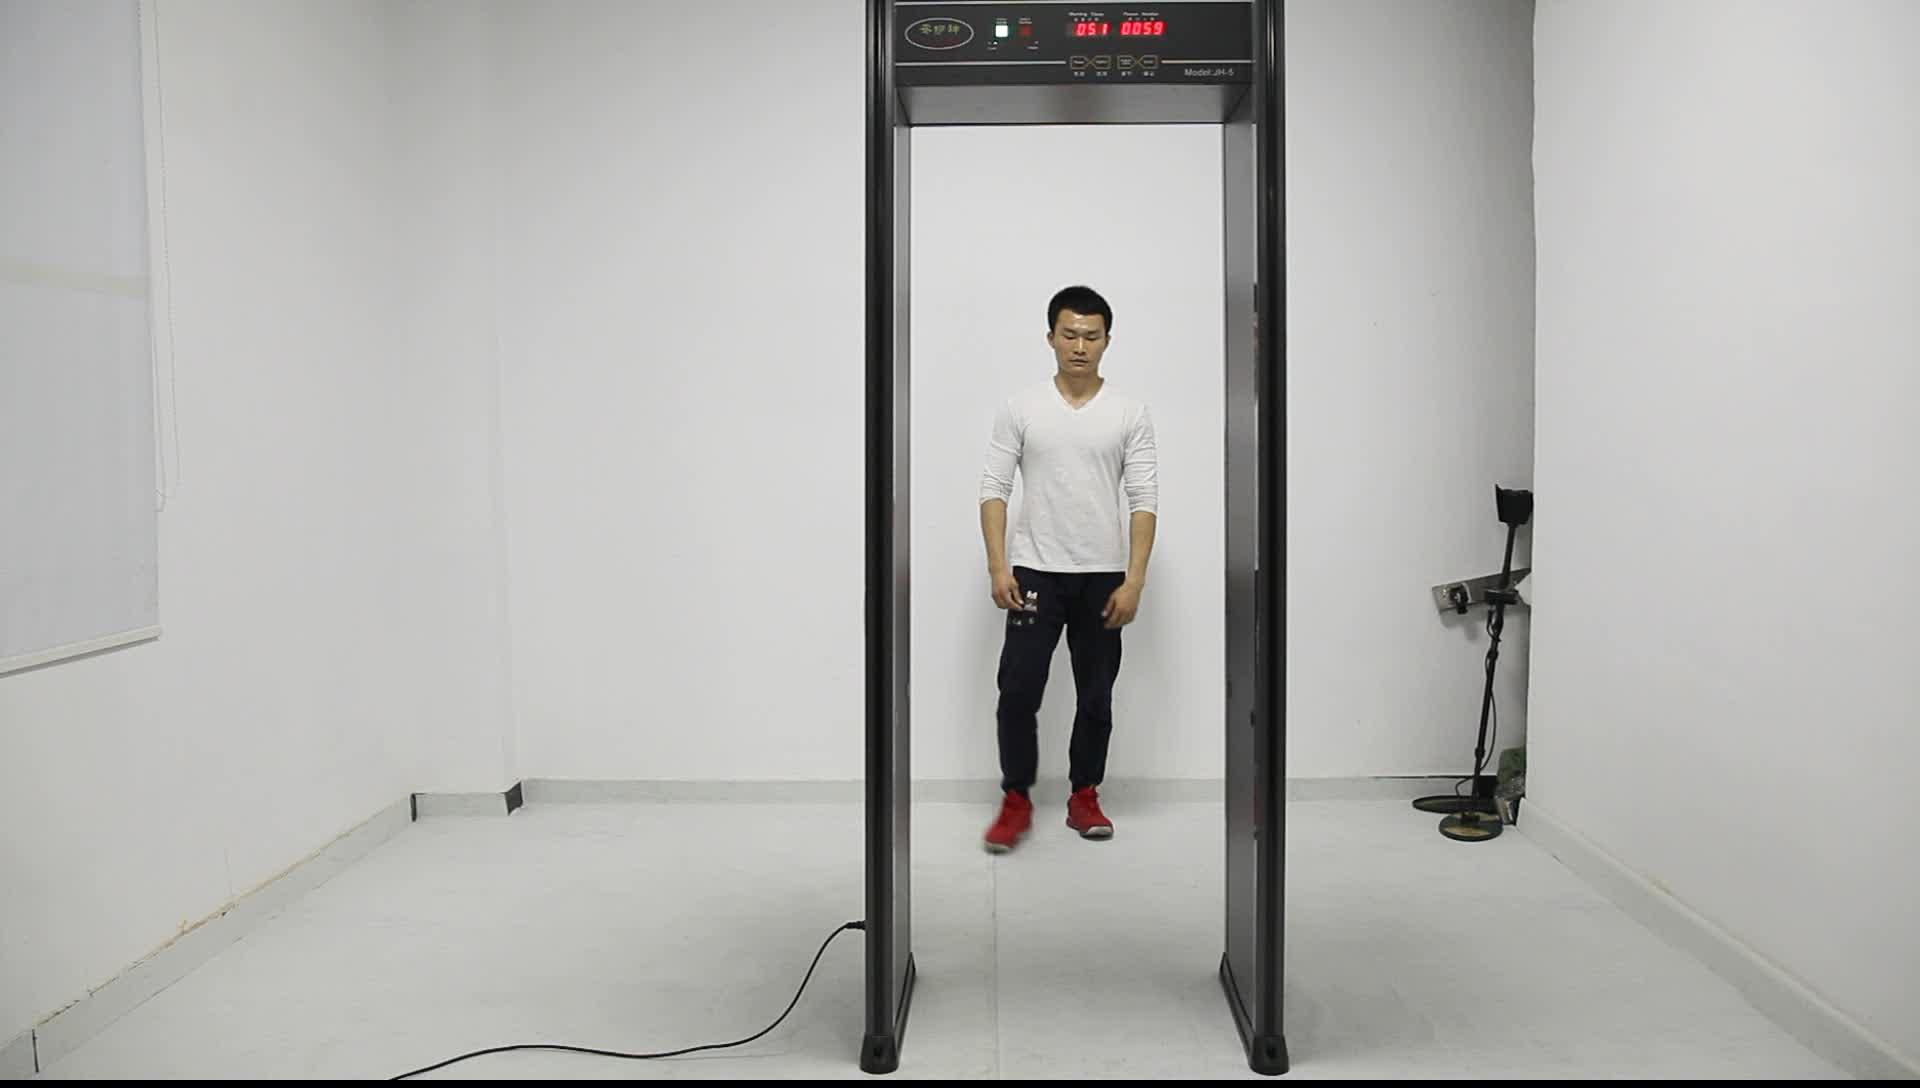 China Factory Wholesale Price 6 Zones Walk Through Metal Detector Archway Metal Detector